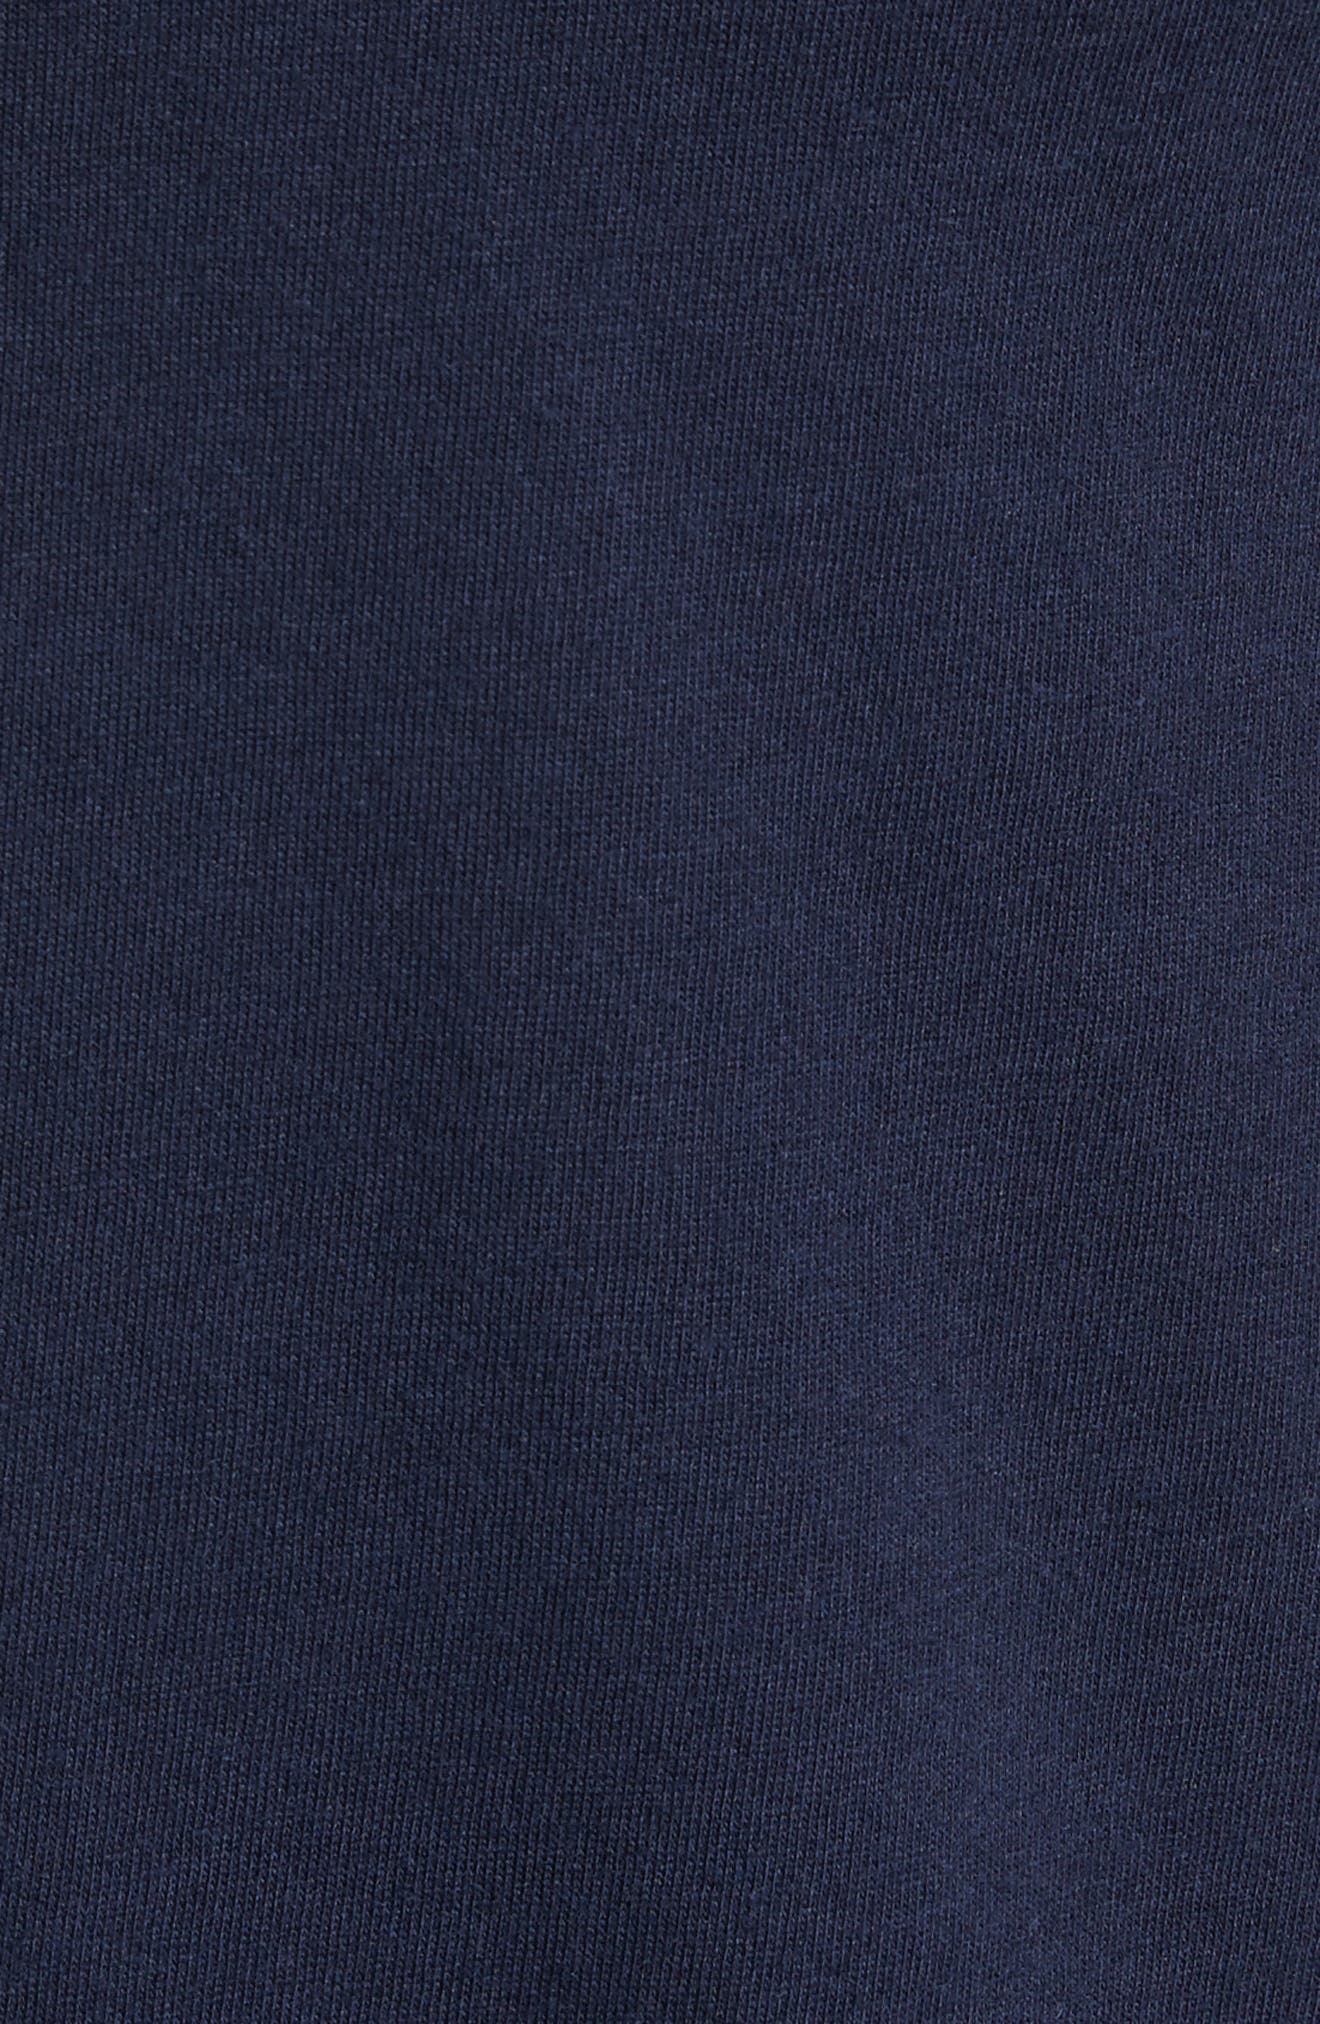 Elliott Henley T-Shirt,                             Alternate thumbnail 5, color,                             Deep Navy